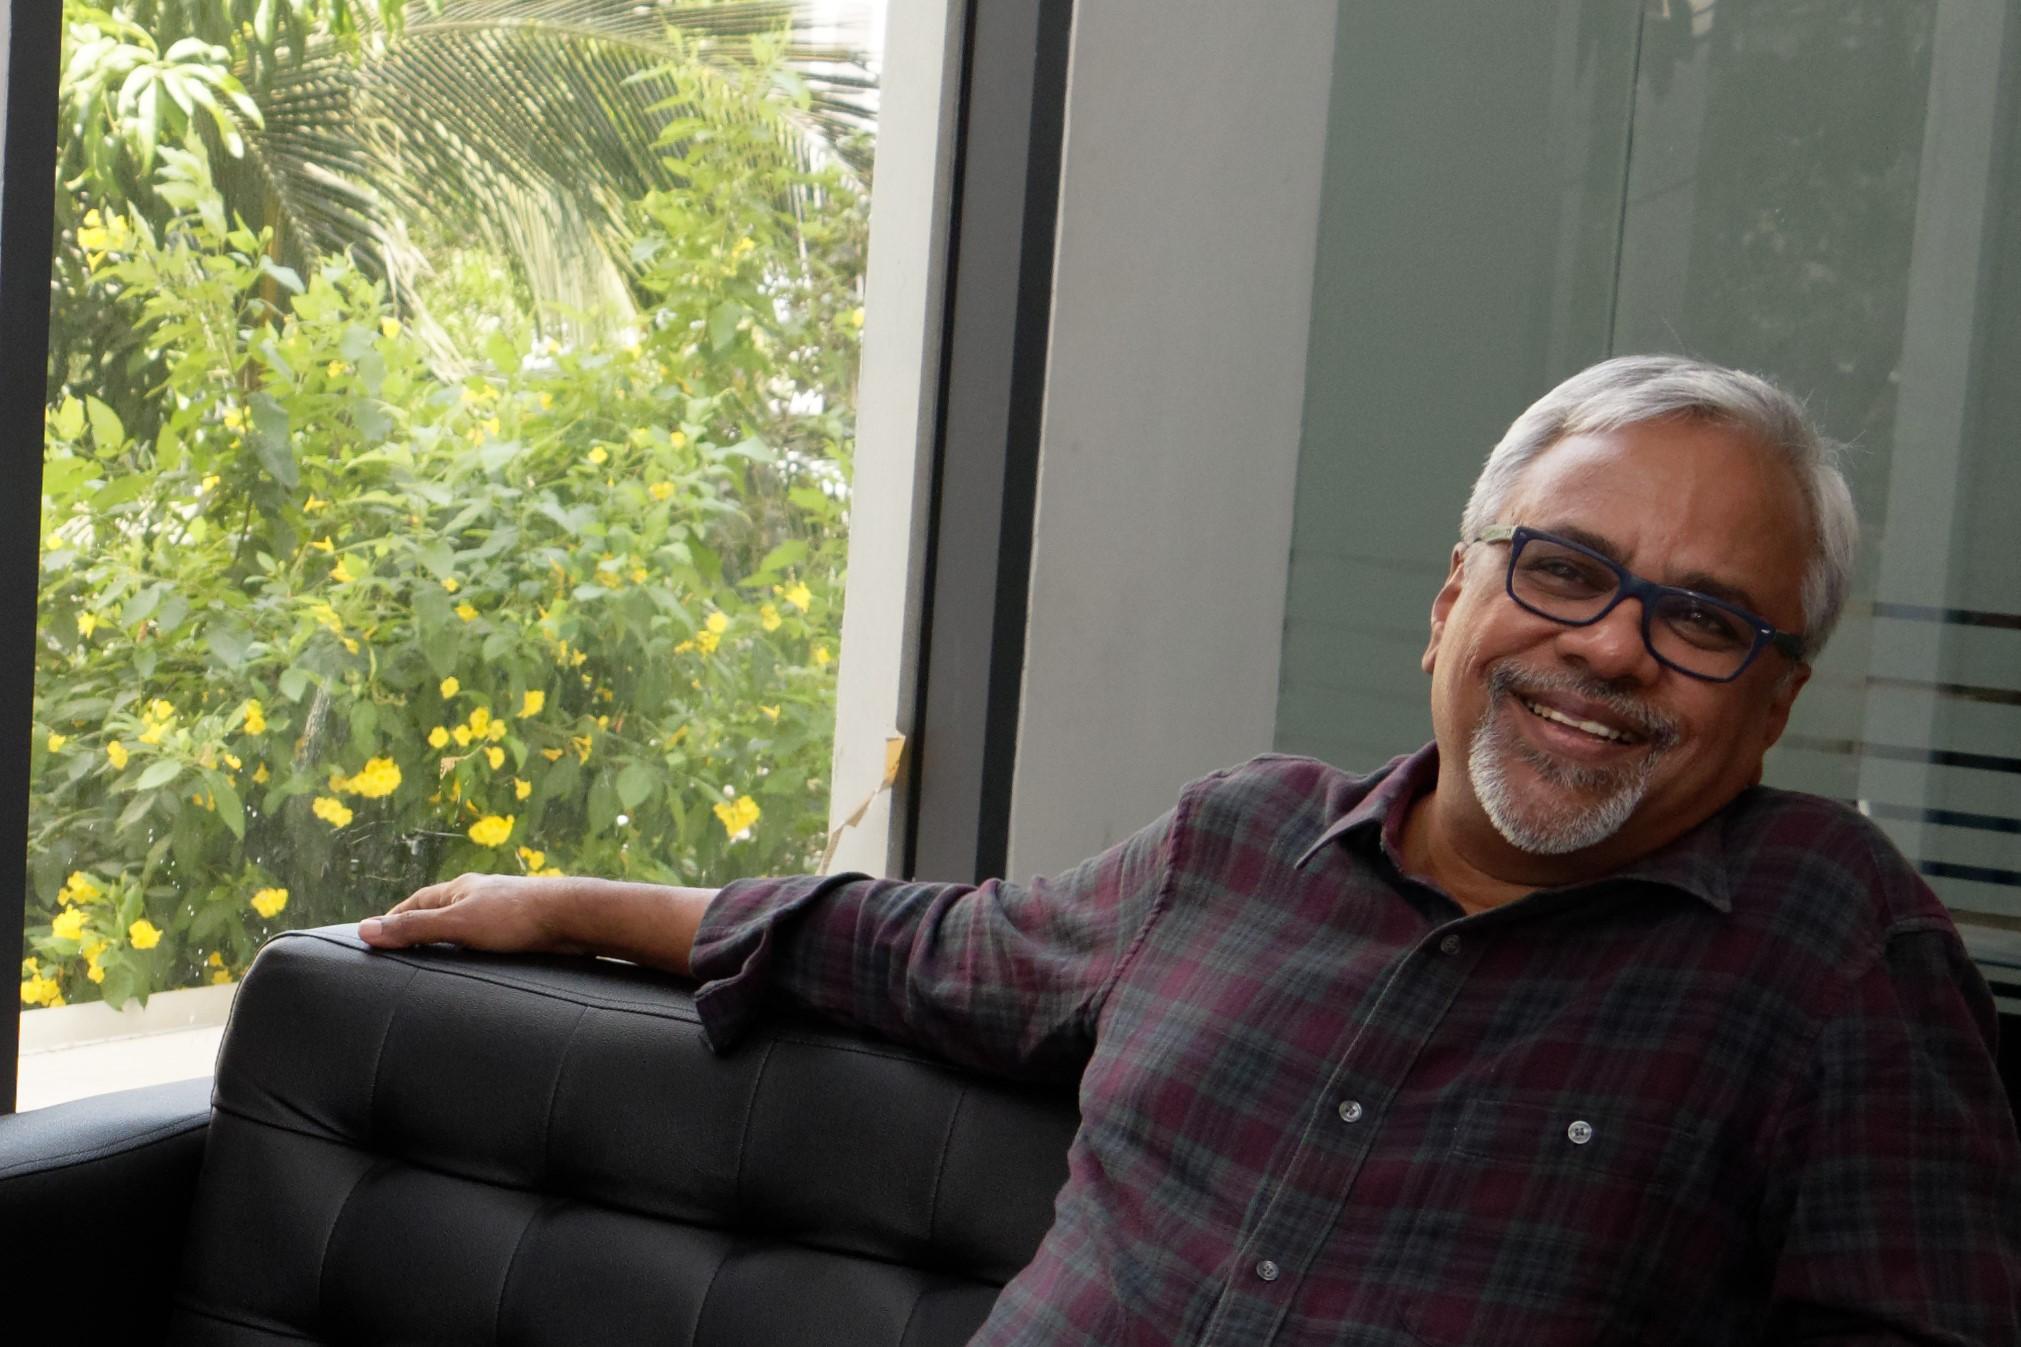 Jayendra Panchapakesan - Option 2 - Photo Credit - Vinodh Velayudhan